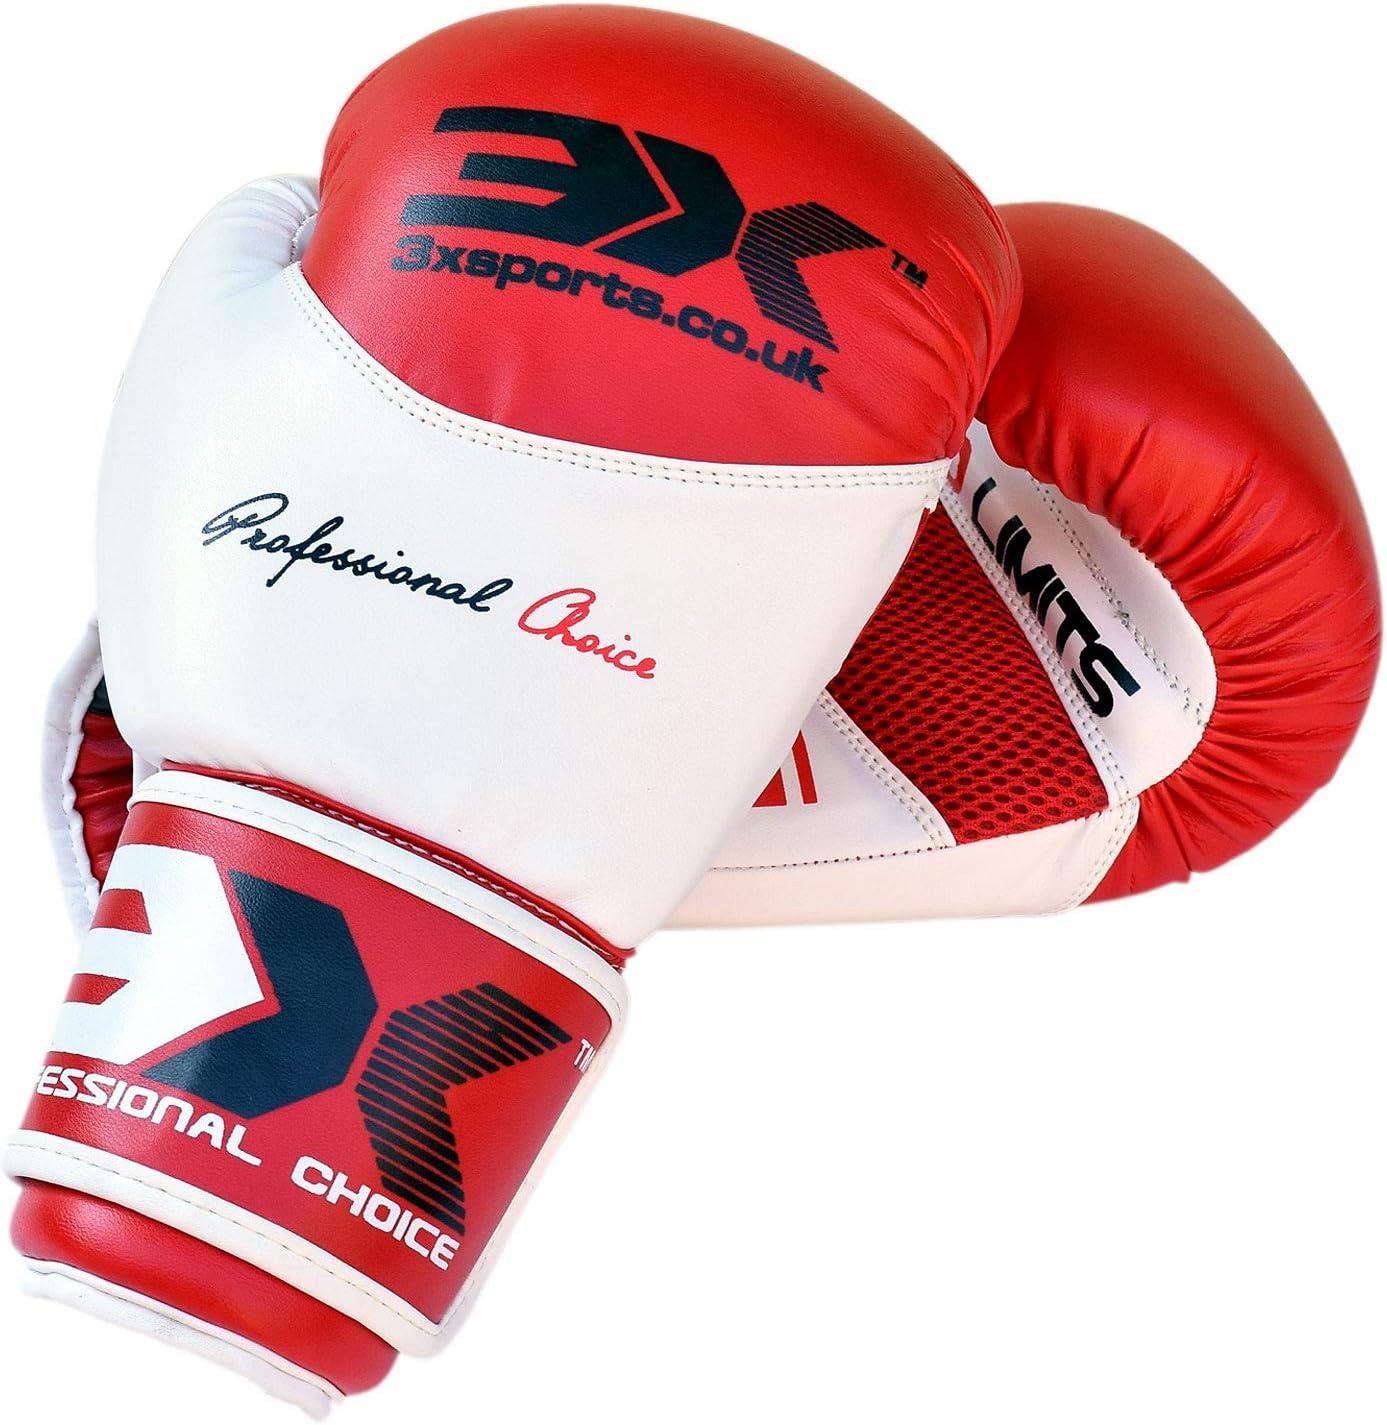 3X Professional Choice Gants de Boxe Kickboxing Muay Thai Gant Sac Frappe Sparring Entrainement Maya Hide Cuir Mitaines Competition Multi Couleur//Tailles